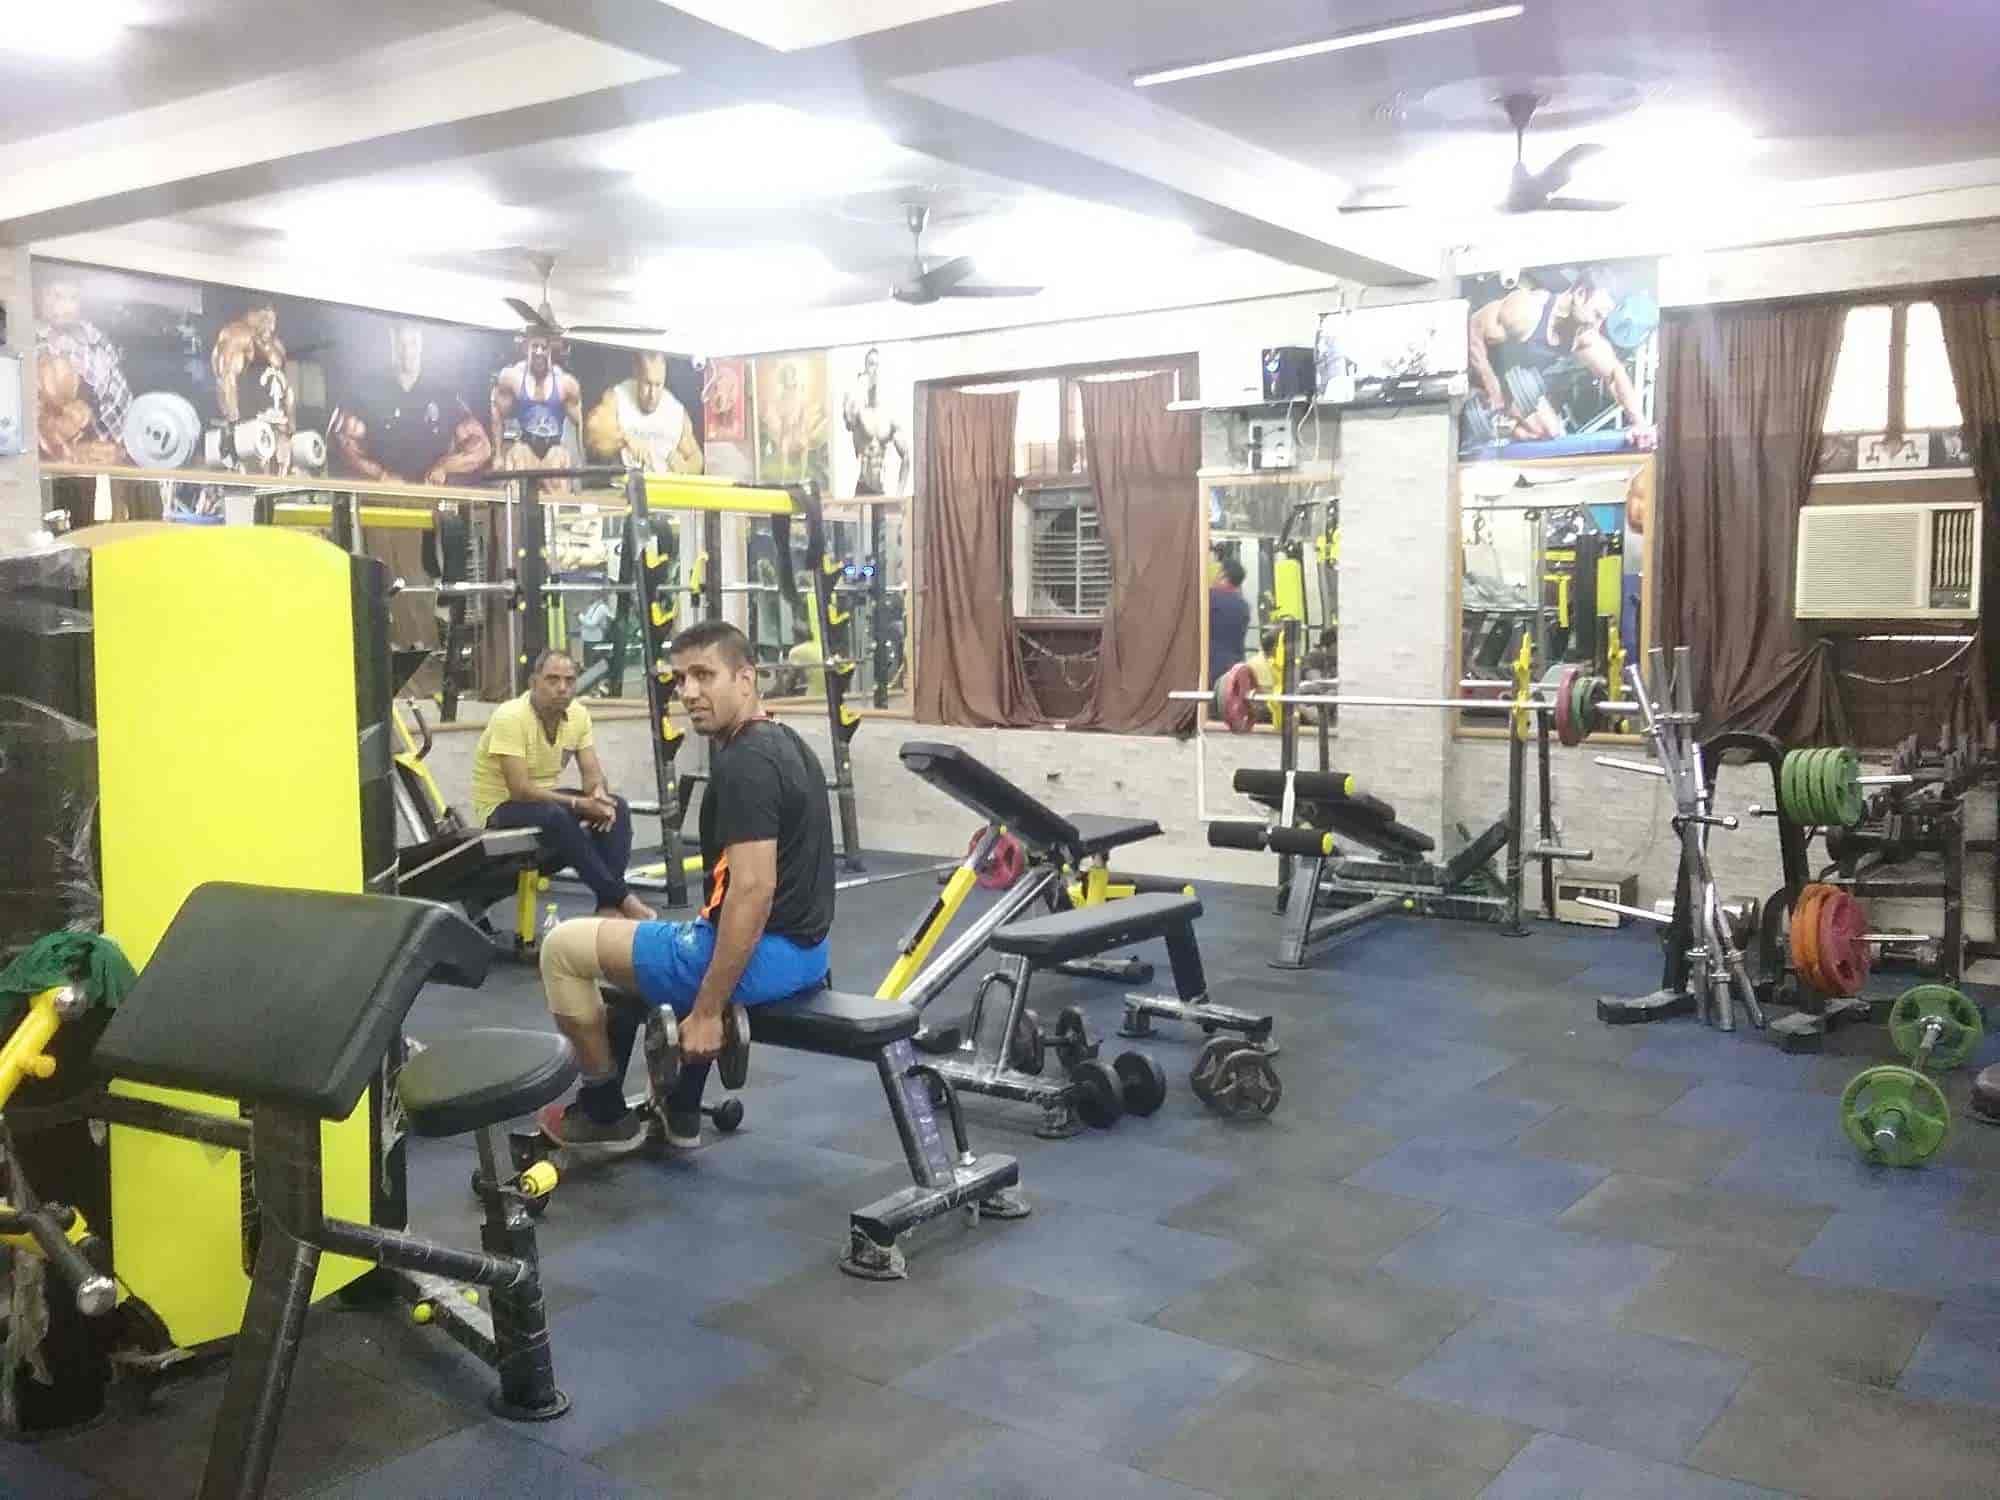 Nfi fitness and spa krishna nagar gyms in delhi justdial